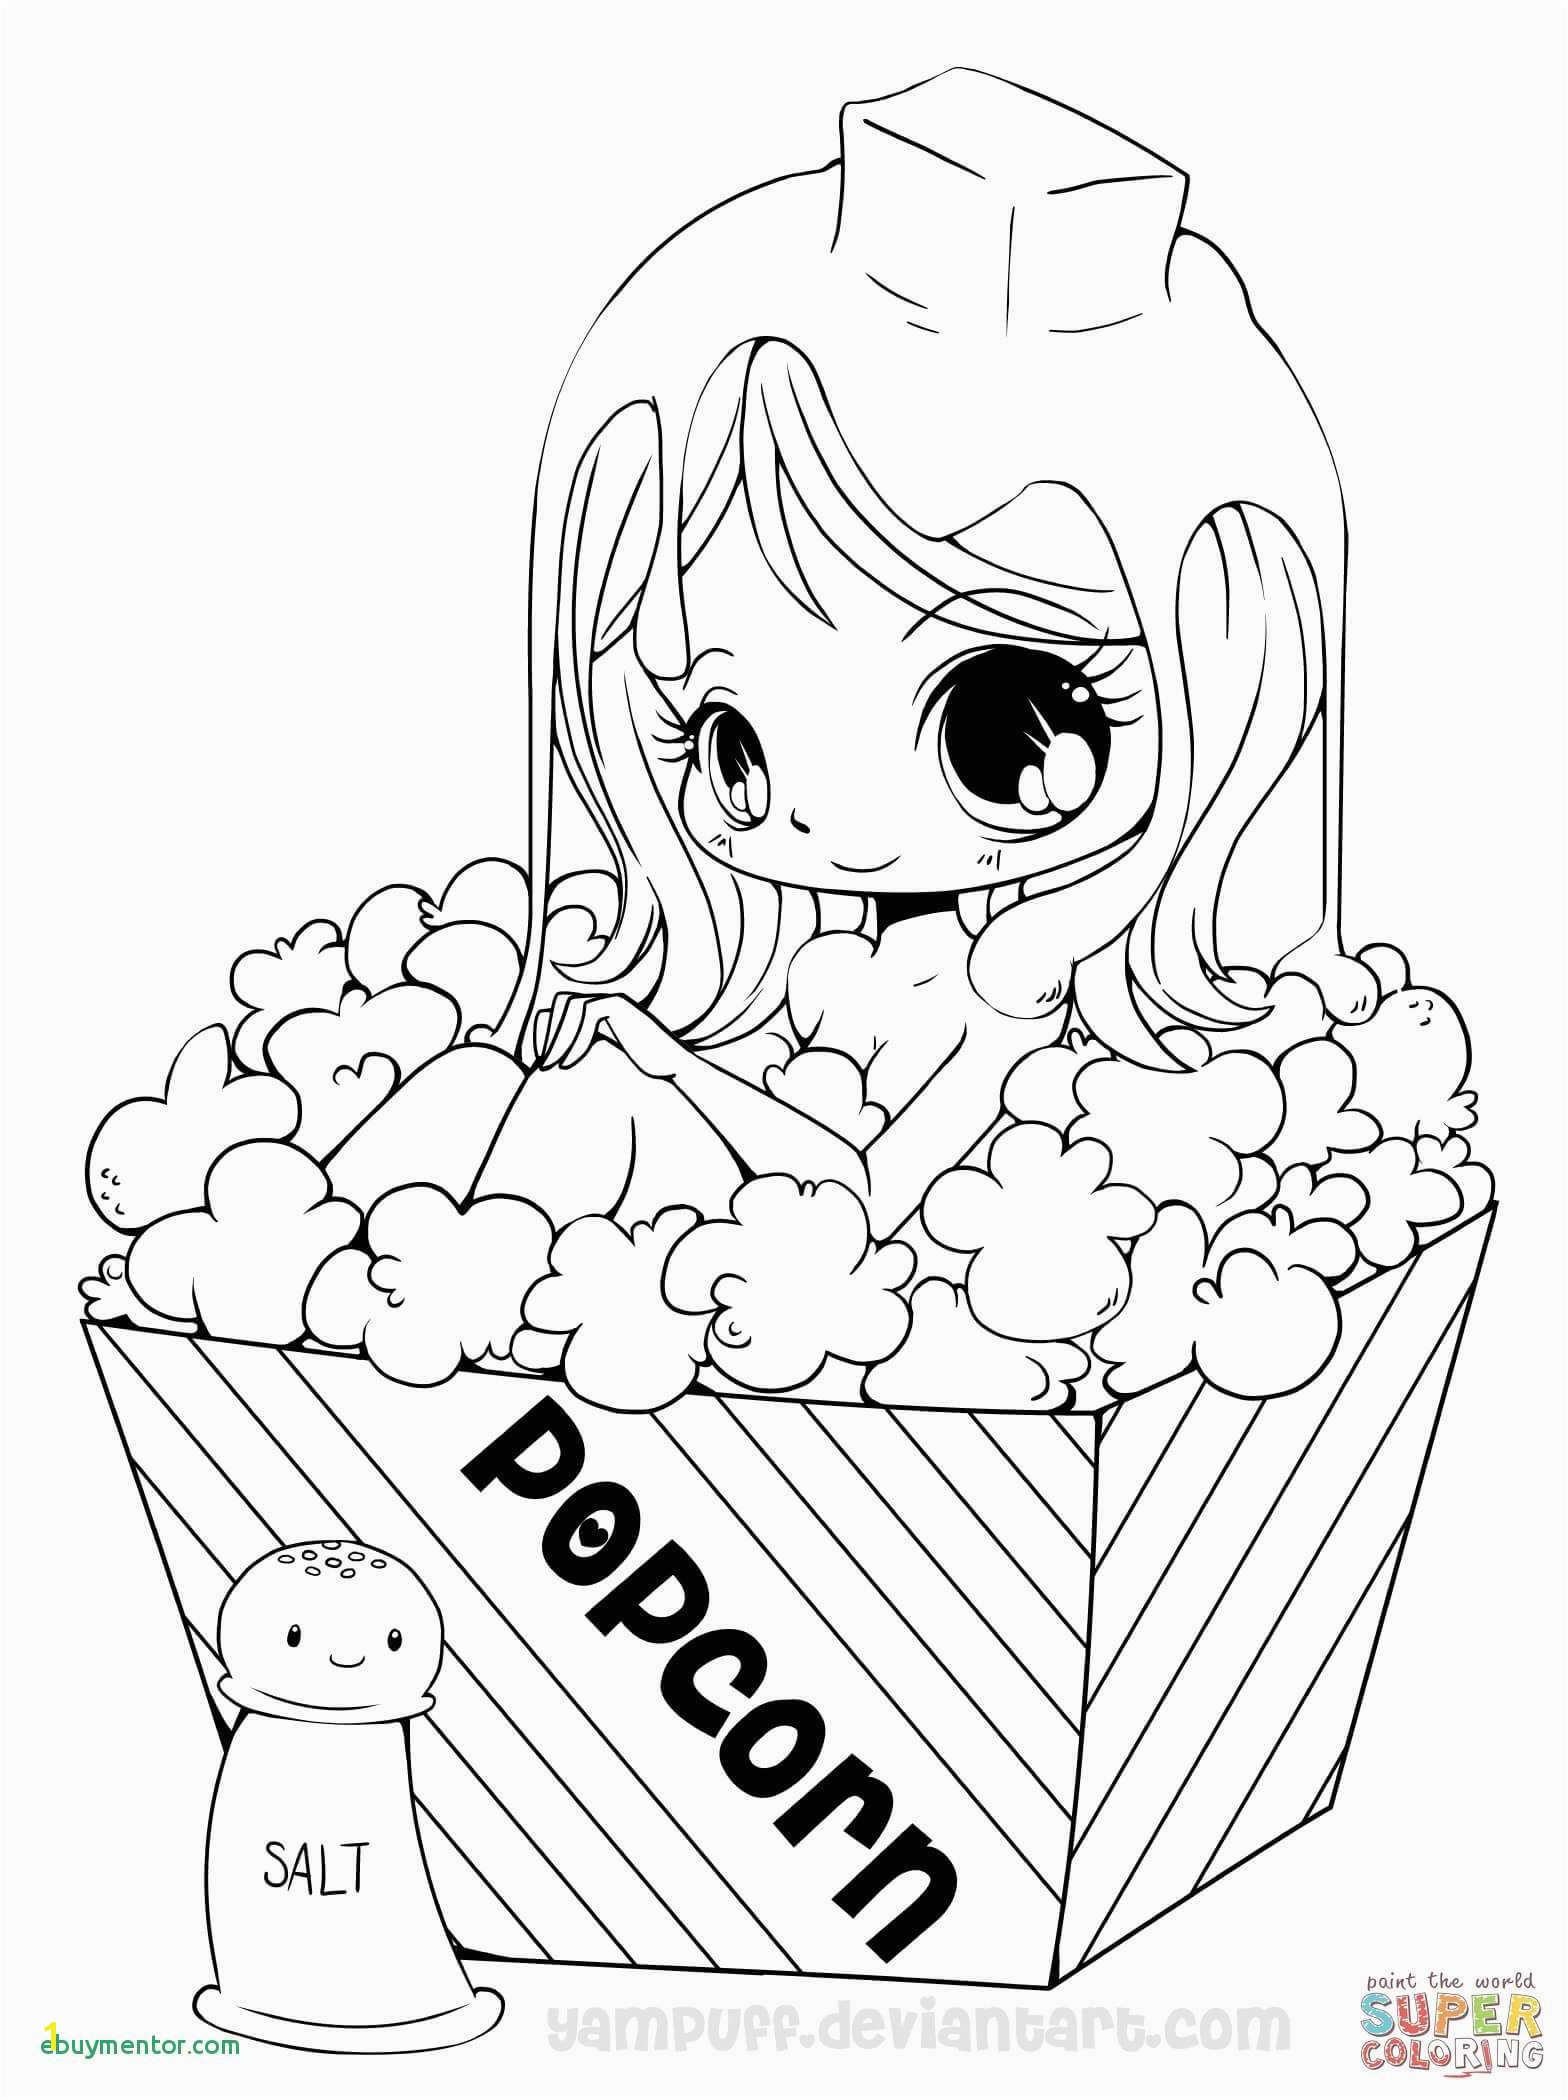 Kawaii Anime Girl Coloring Pages Cute Anime Chibi Girl Coloring Pages Lovely Witch Coloring Page